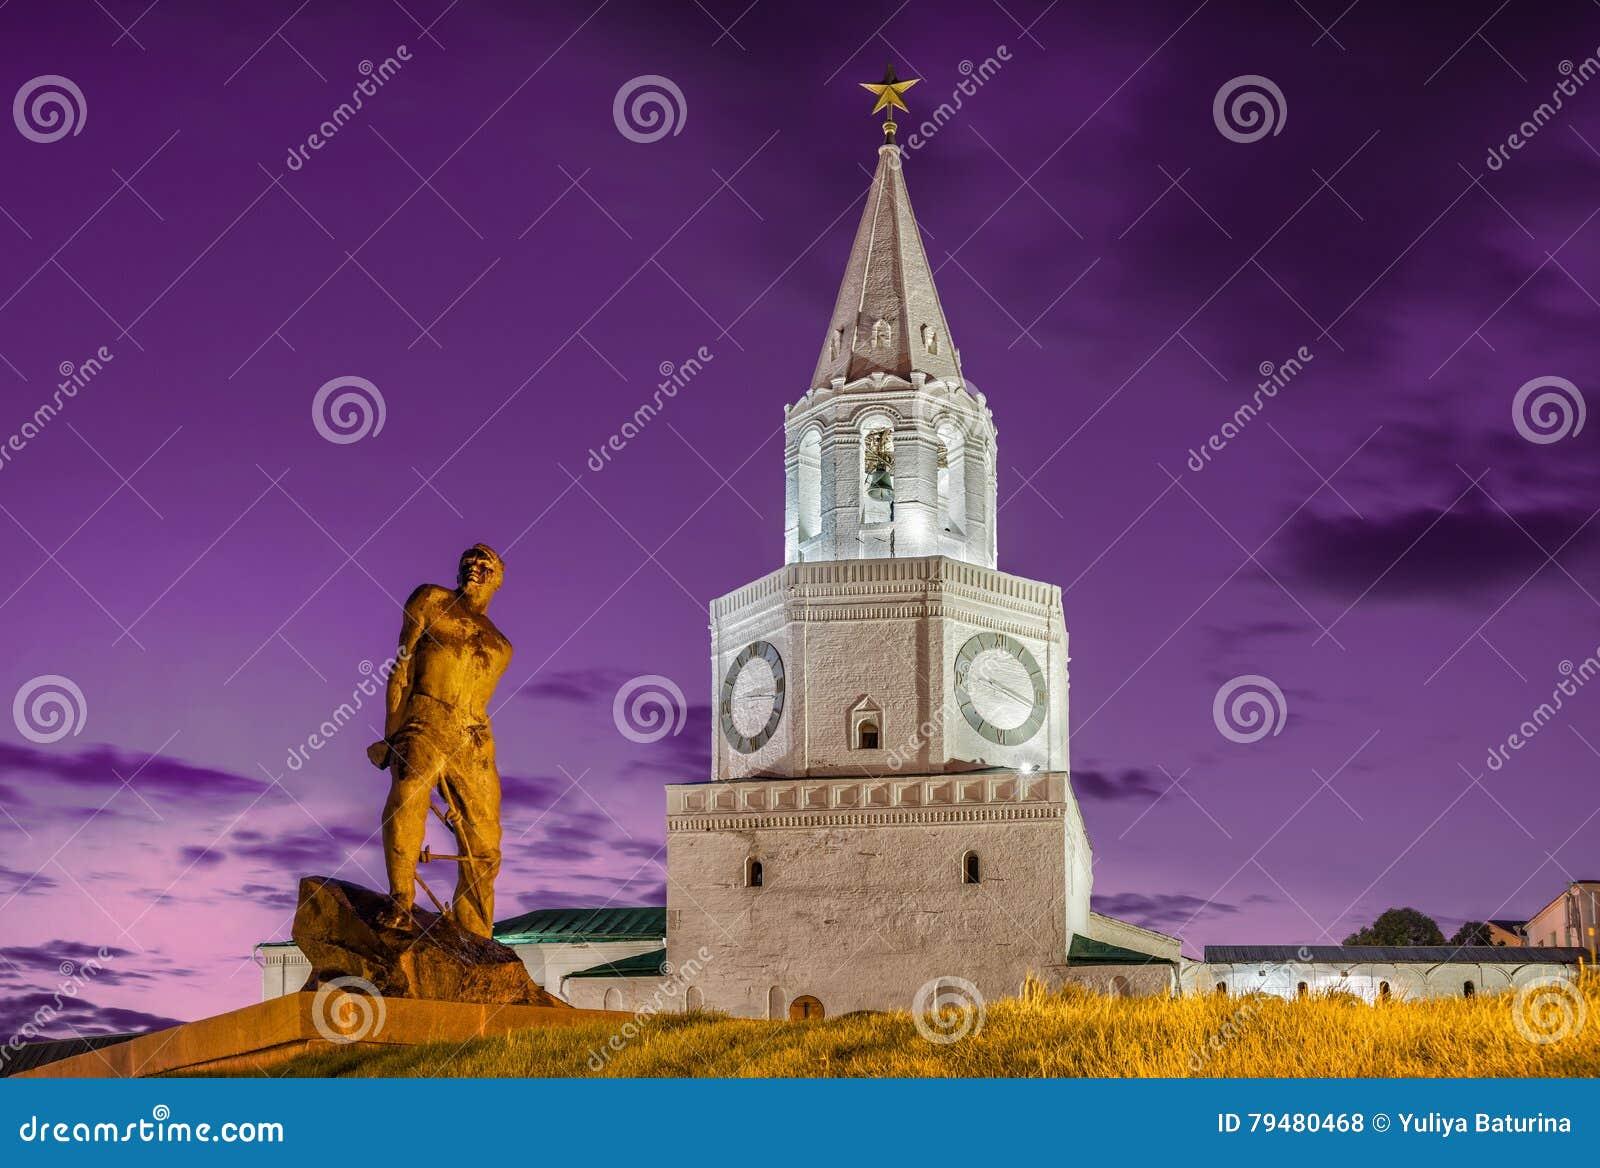 Kazan Monuments in purple sky